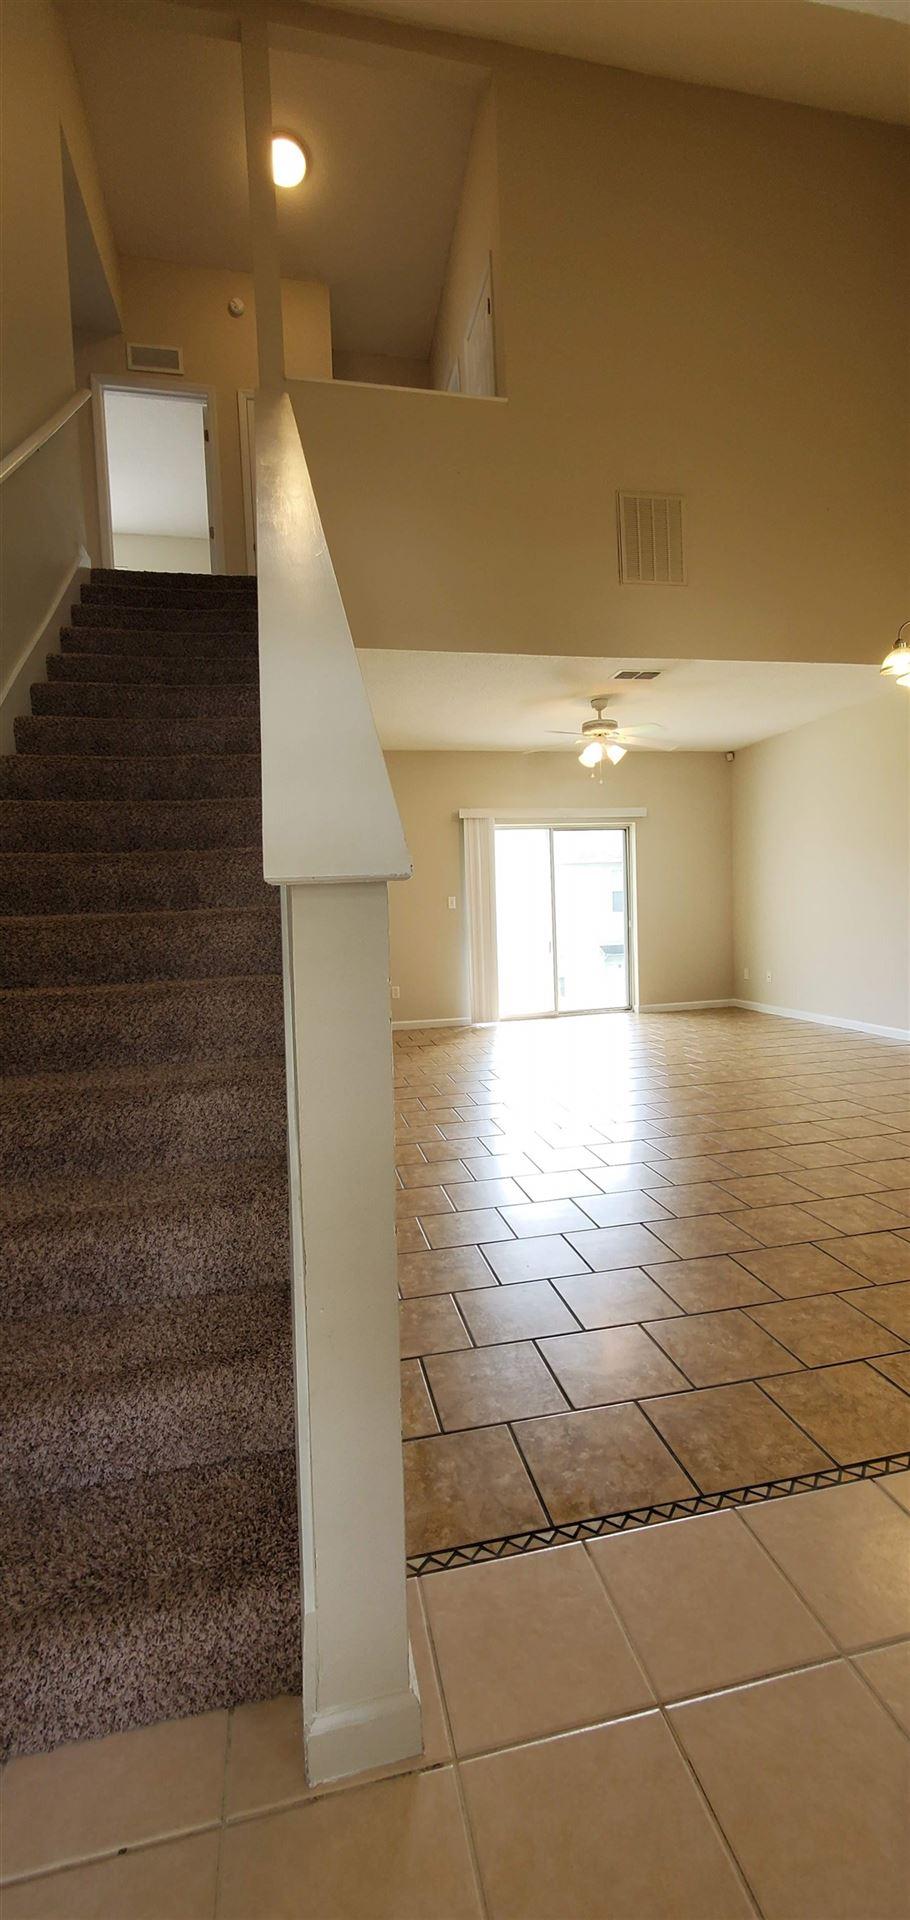 Photo of 1659 Corey Wood Circle, TALLAHASSEE, FL 32304 (MLS # 337402)